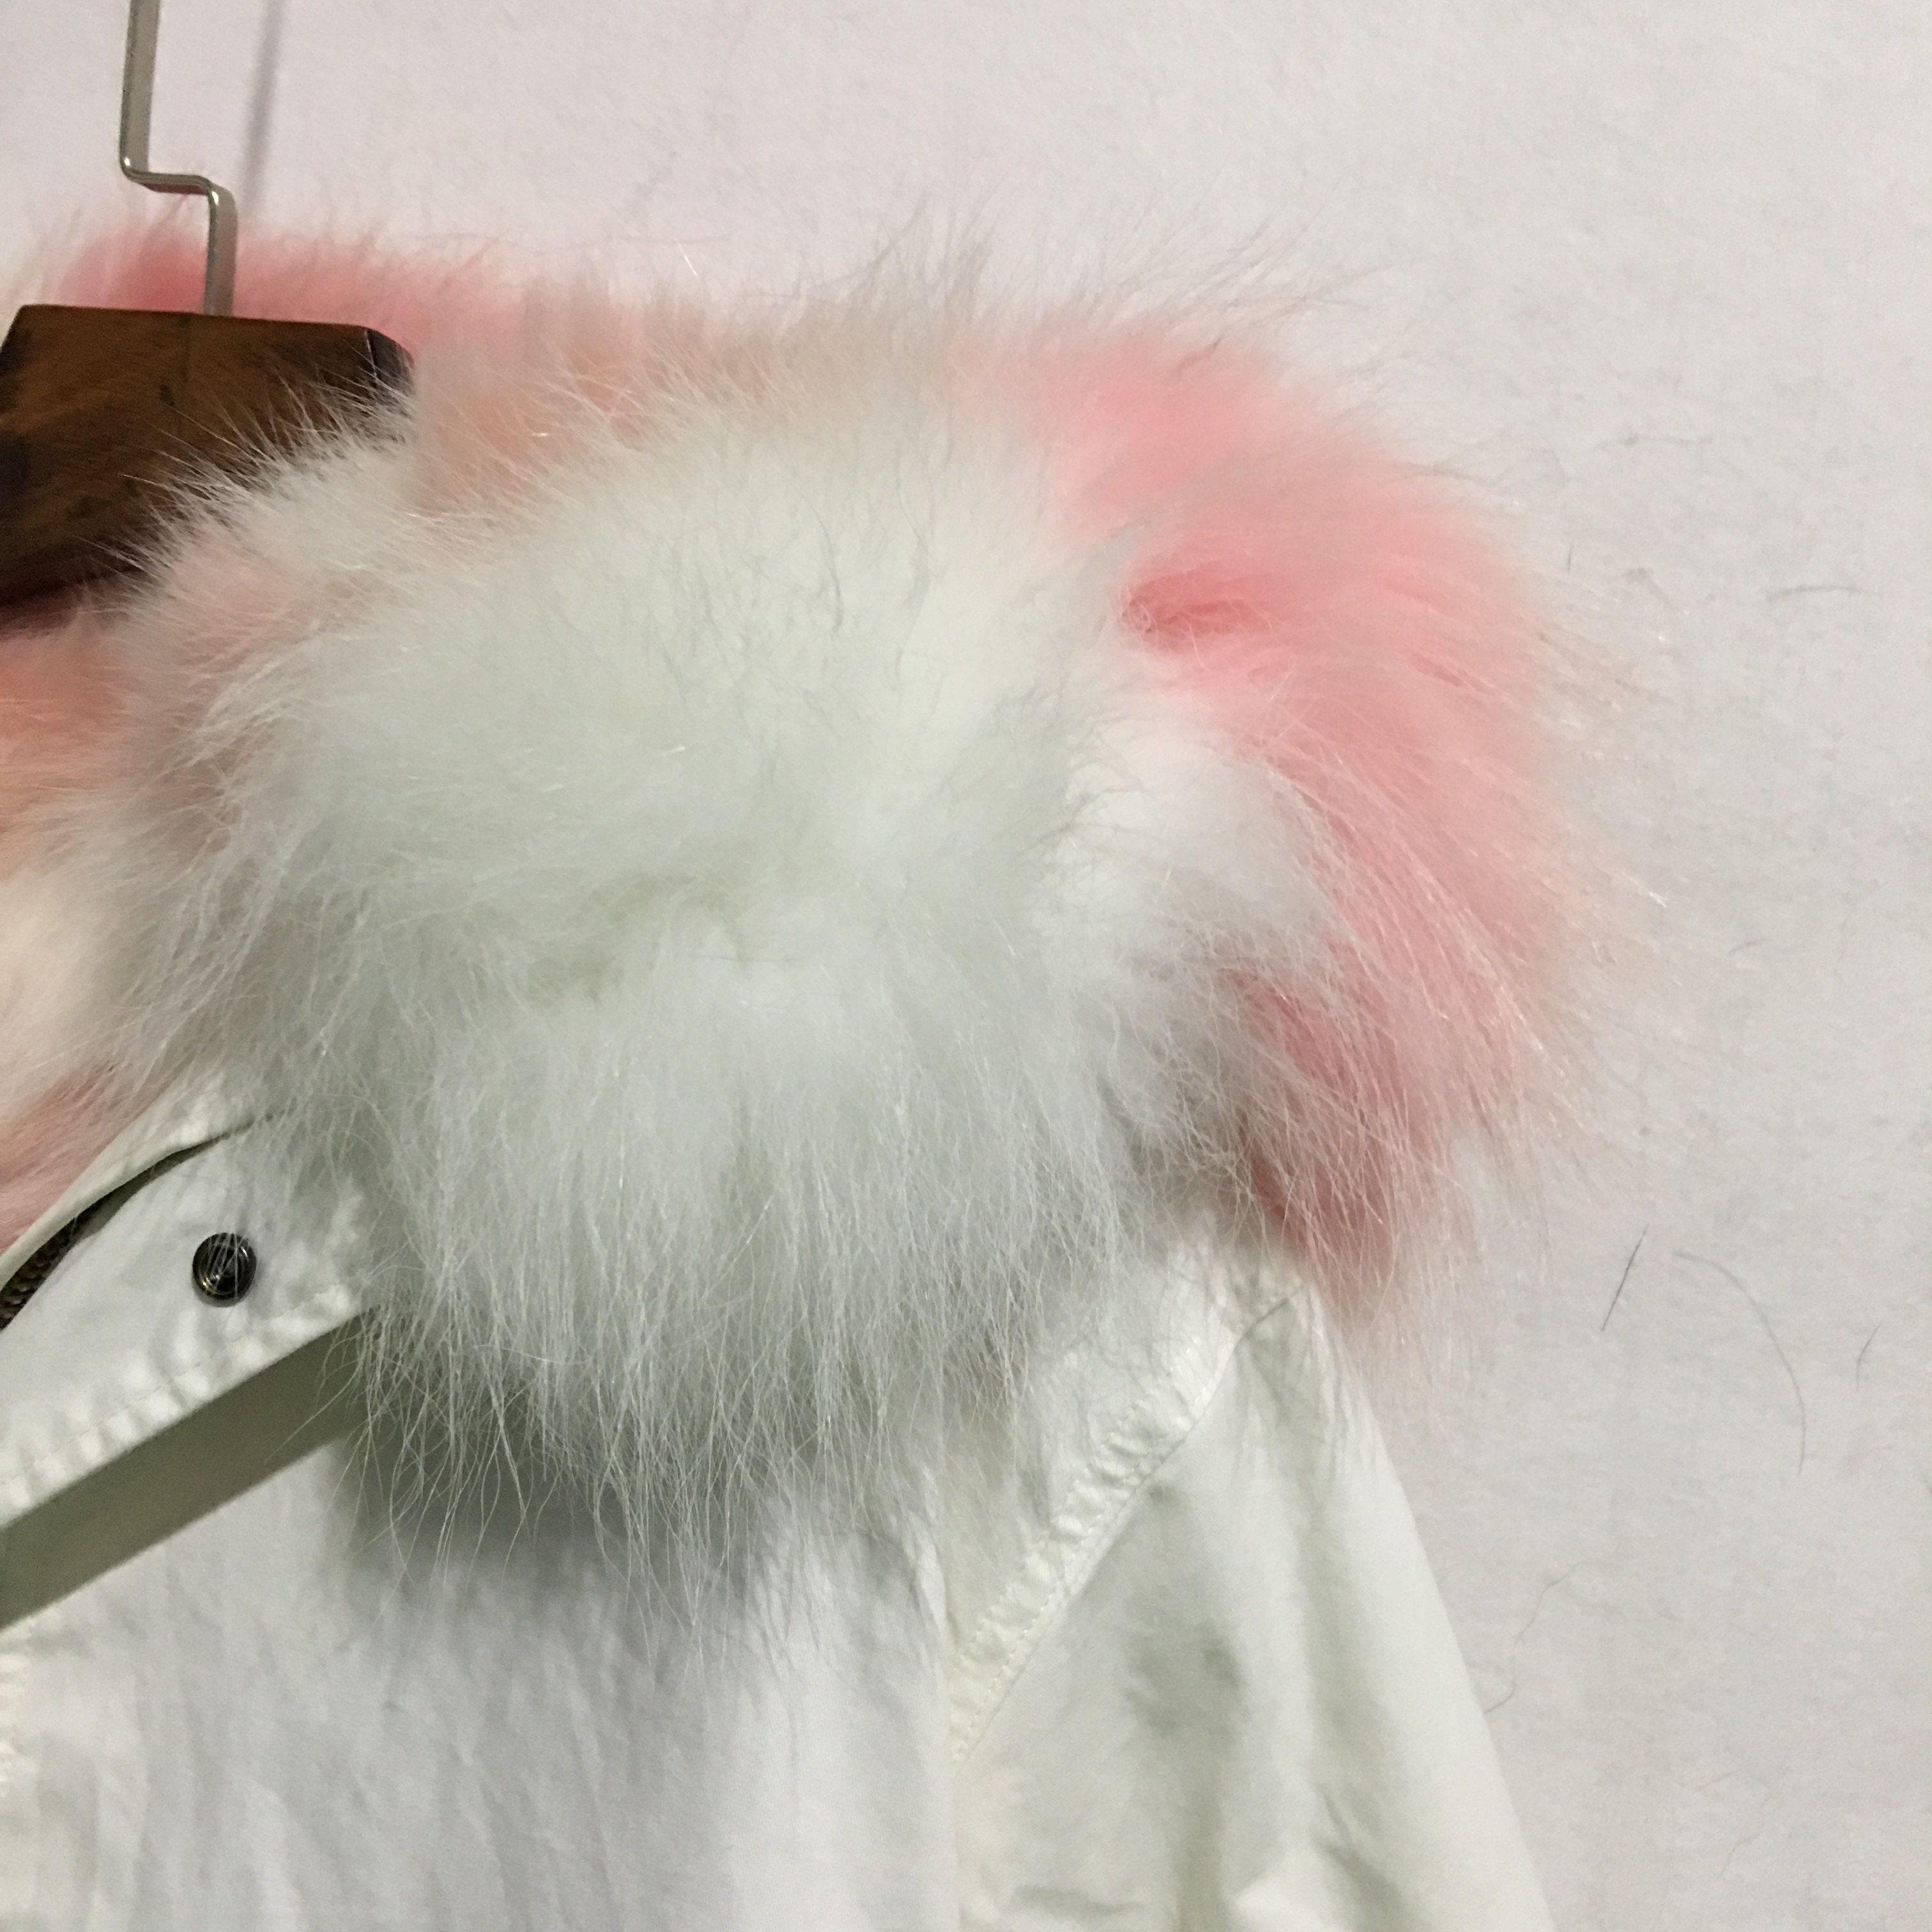 Women's White Mini Cotton Canvas Parka W Fur Trim Babypink in White Color